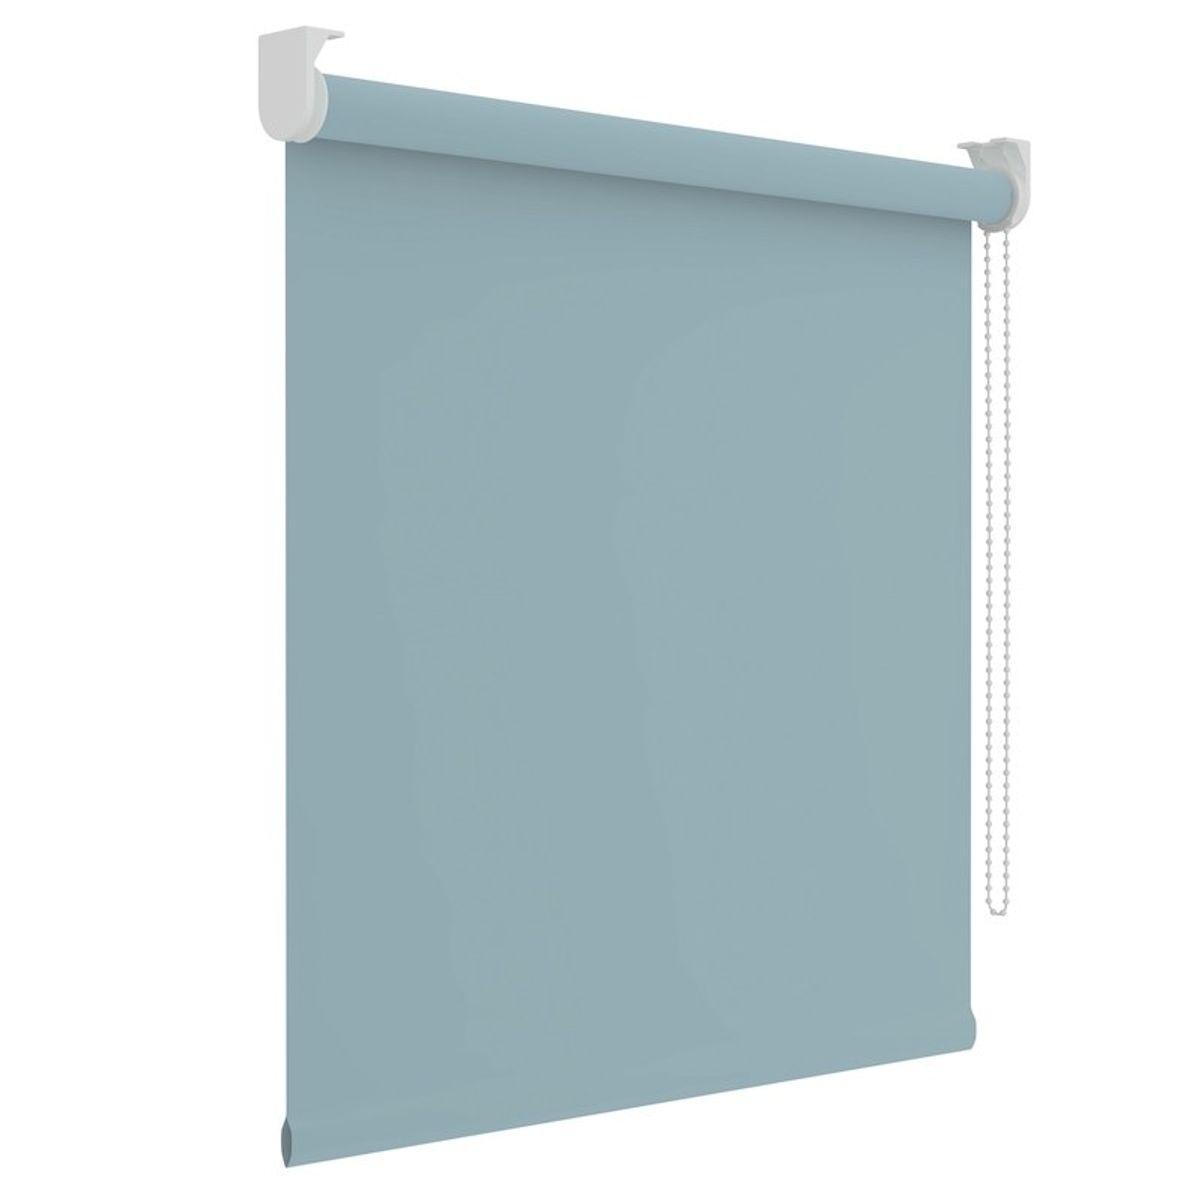 Rolgordijn - Verduisterend - Licht blauw - 60cm x 190cm